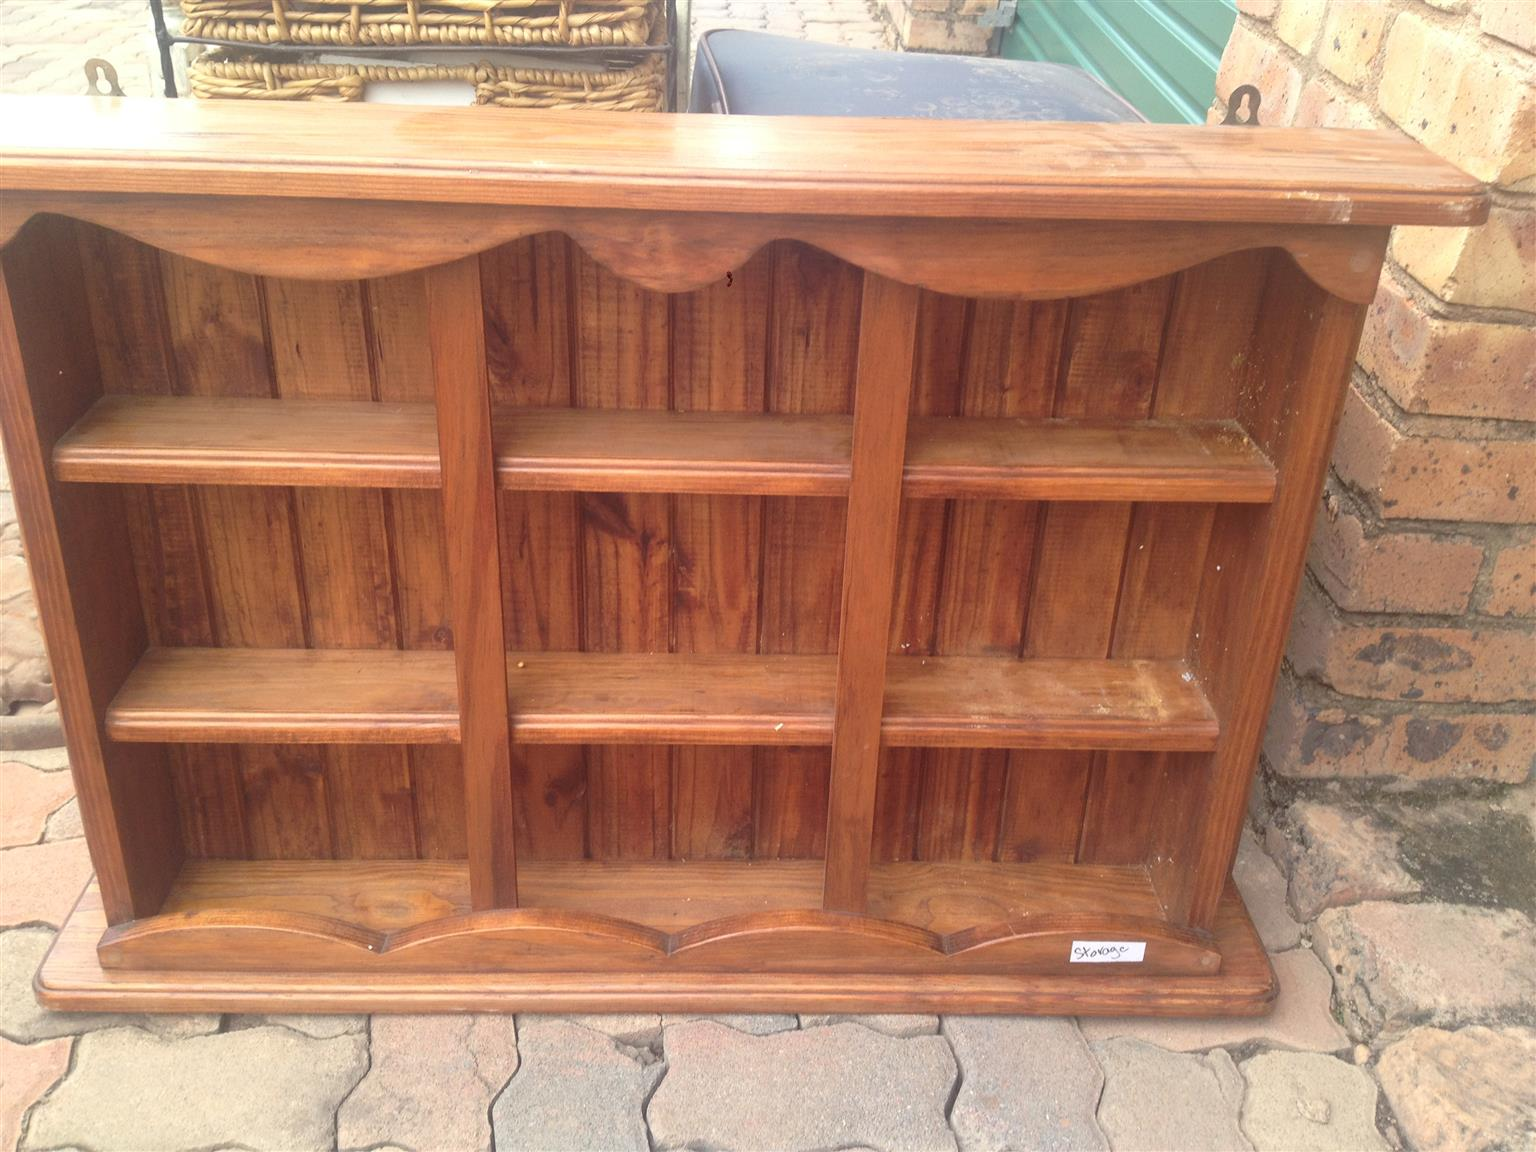 Beautiful wooden spice rack